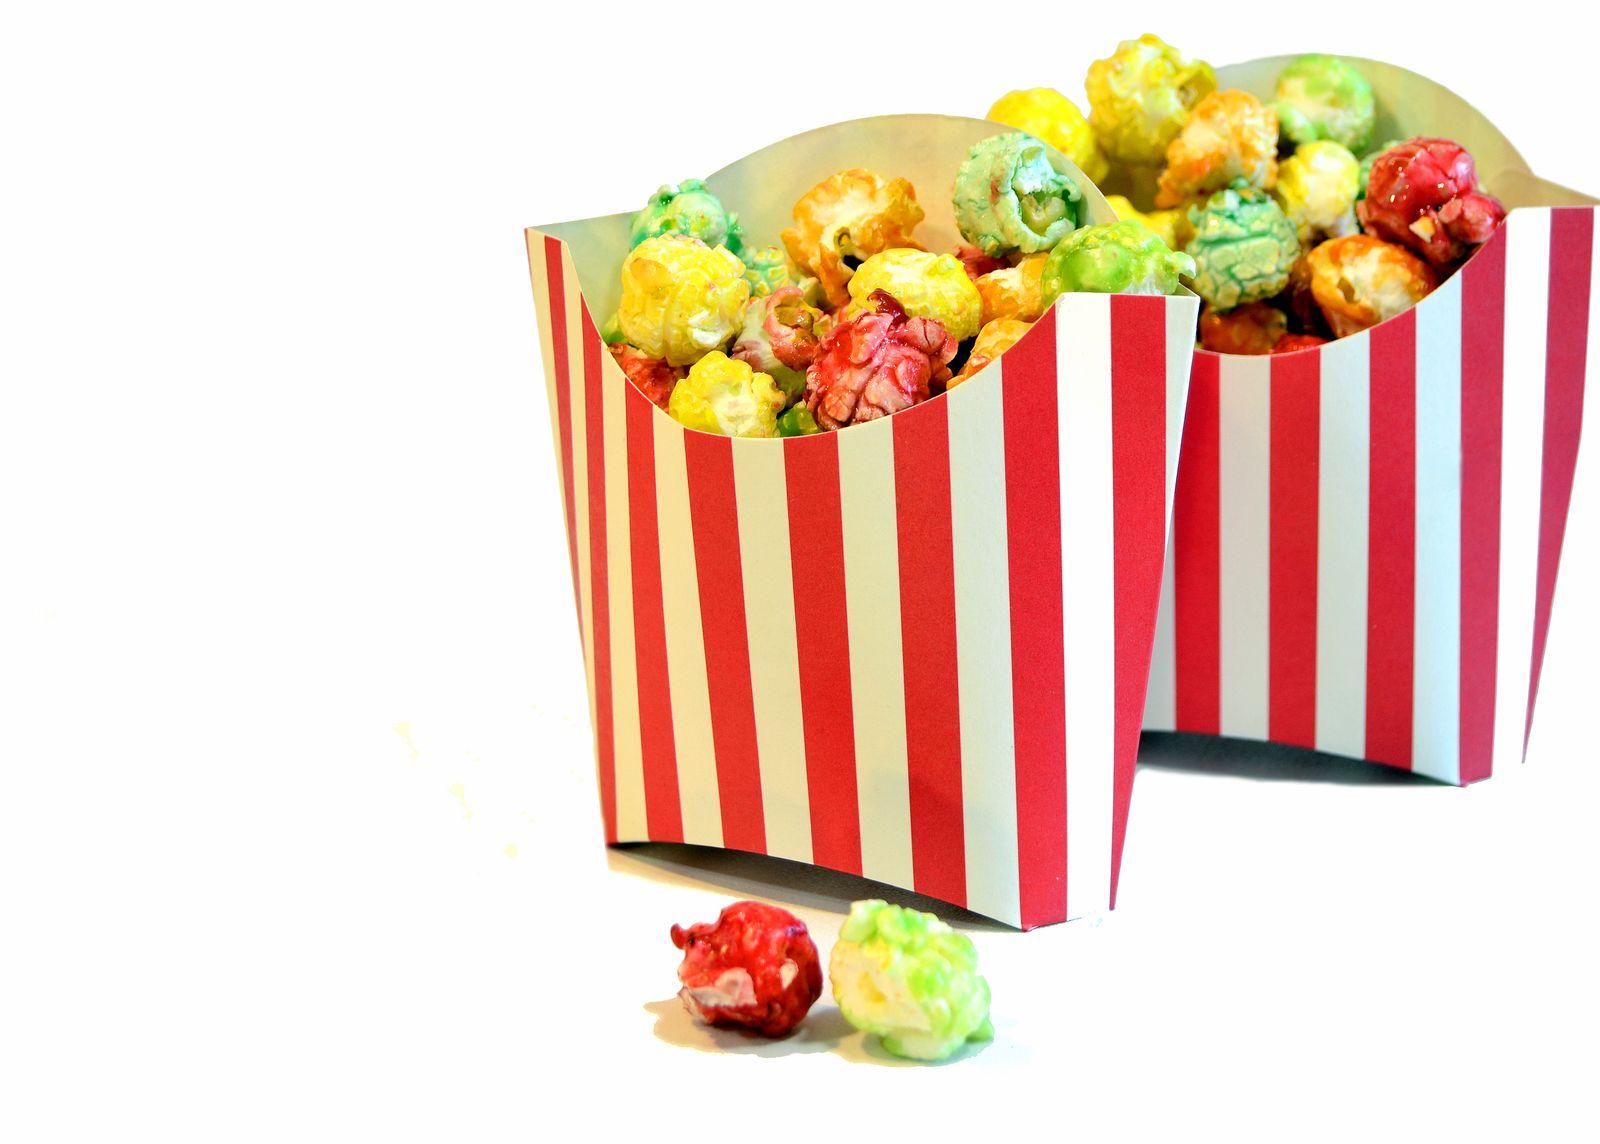 Colorful popcorn